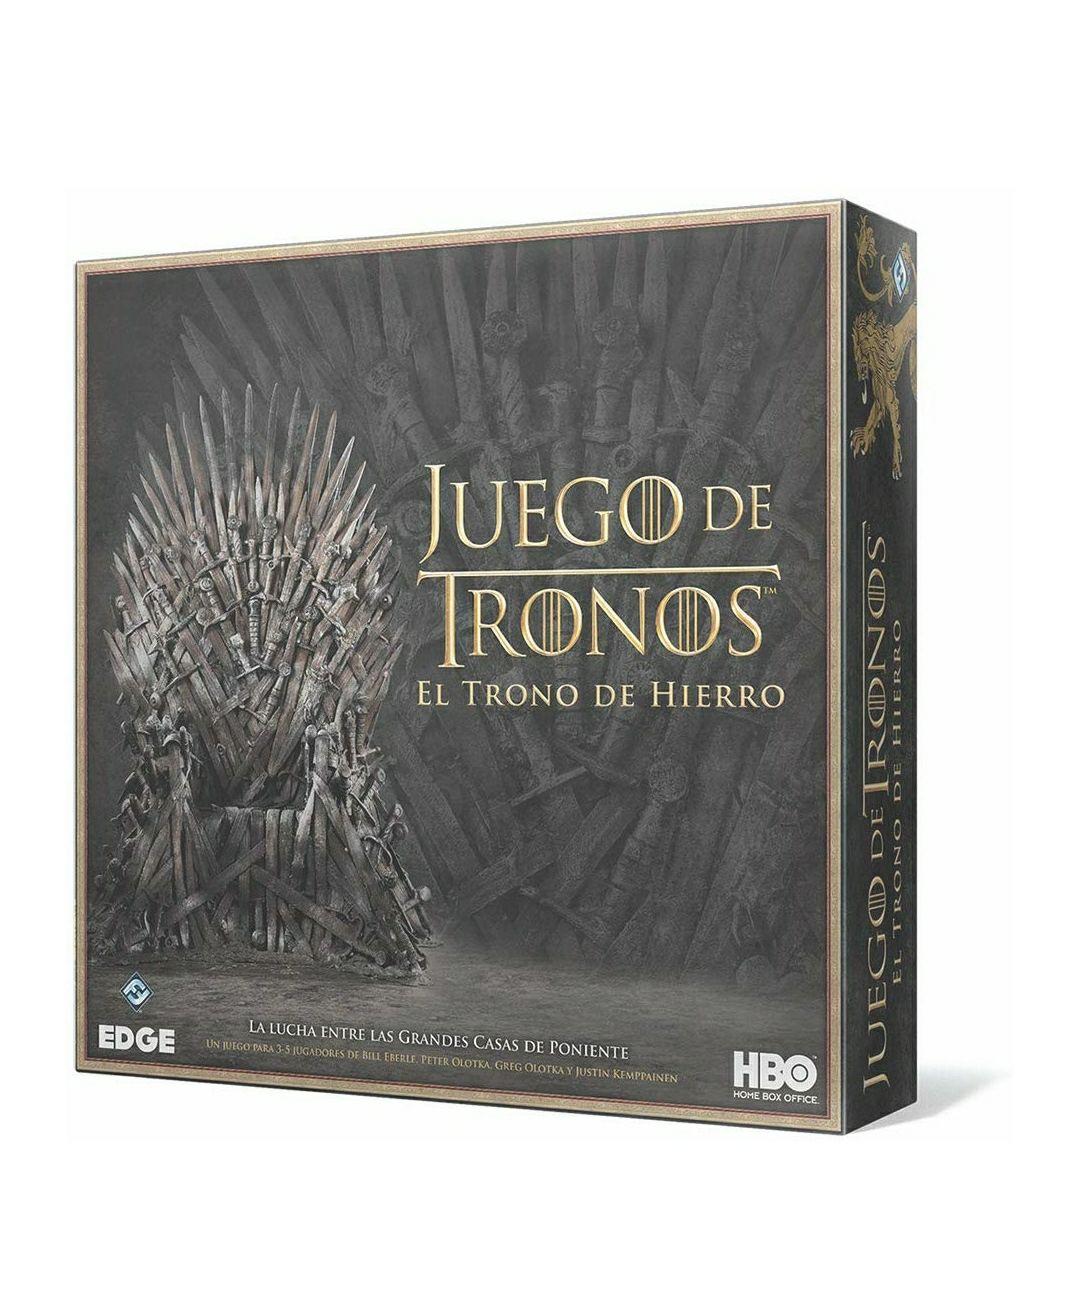 JUEGO DE TRONOS (Juego de mesa)